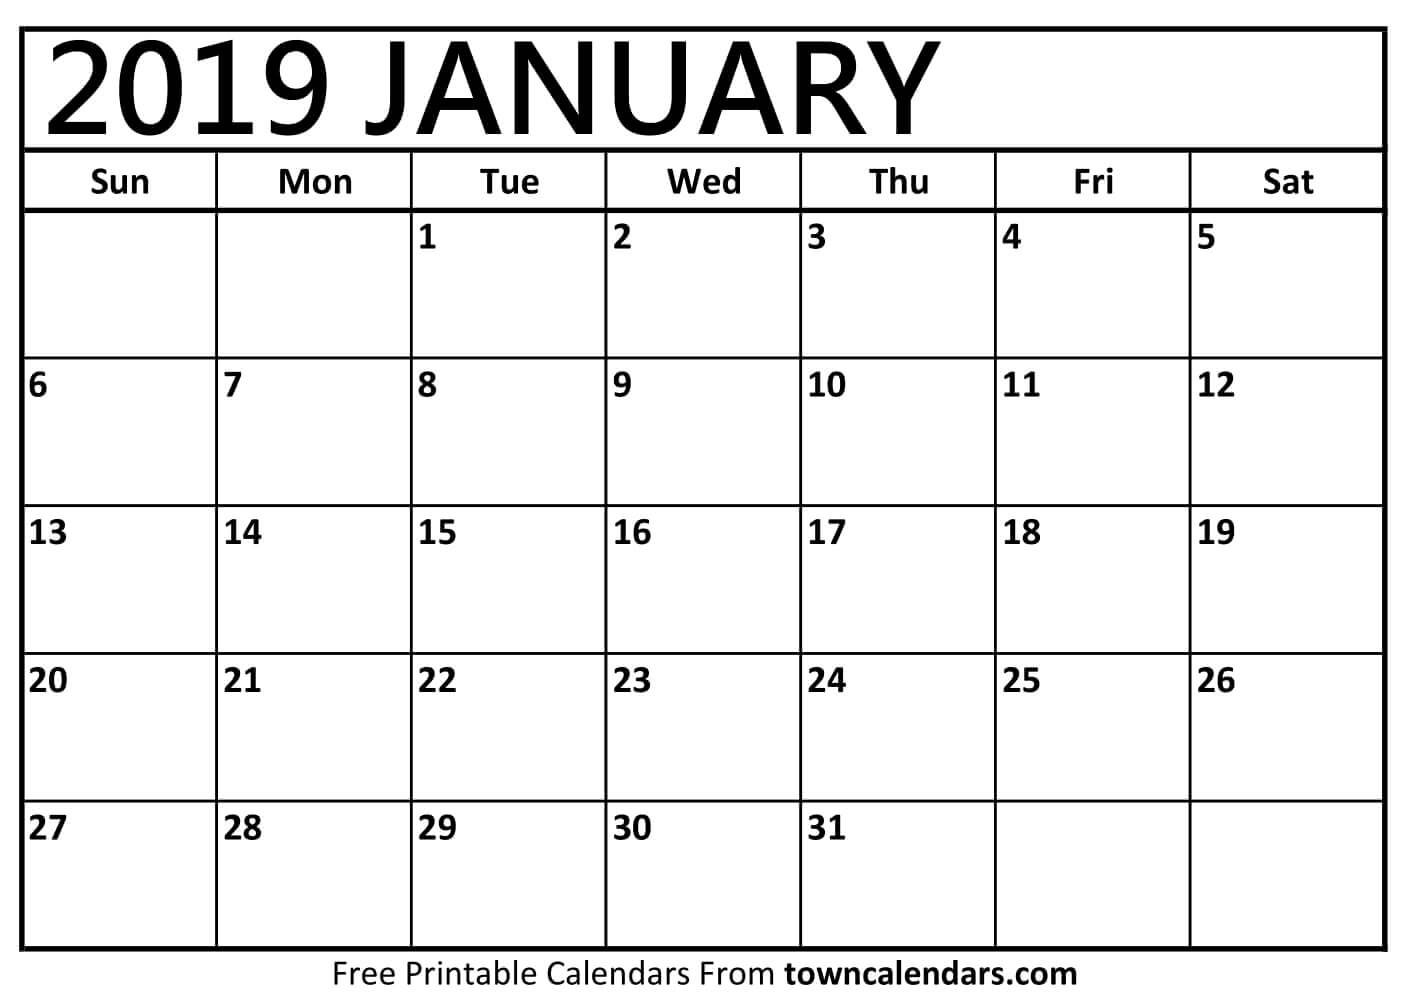 January 2019 Printable Calendar Pdf Free Monthly Template Calendar 2019 January Pdf